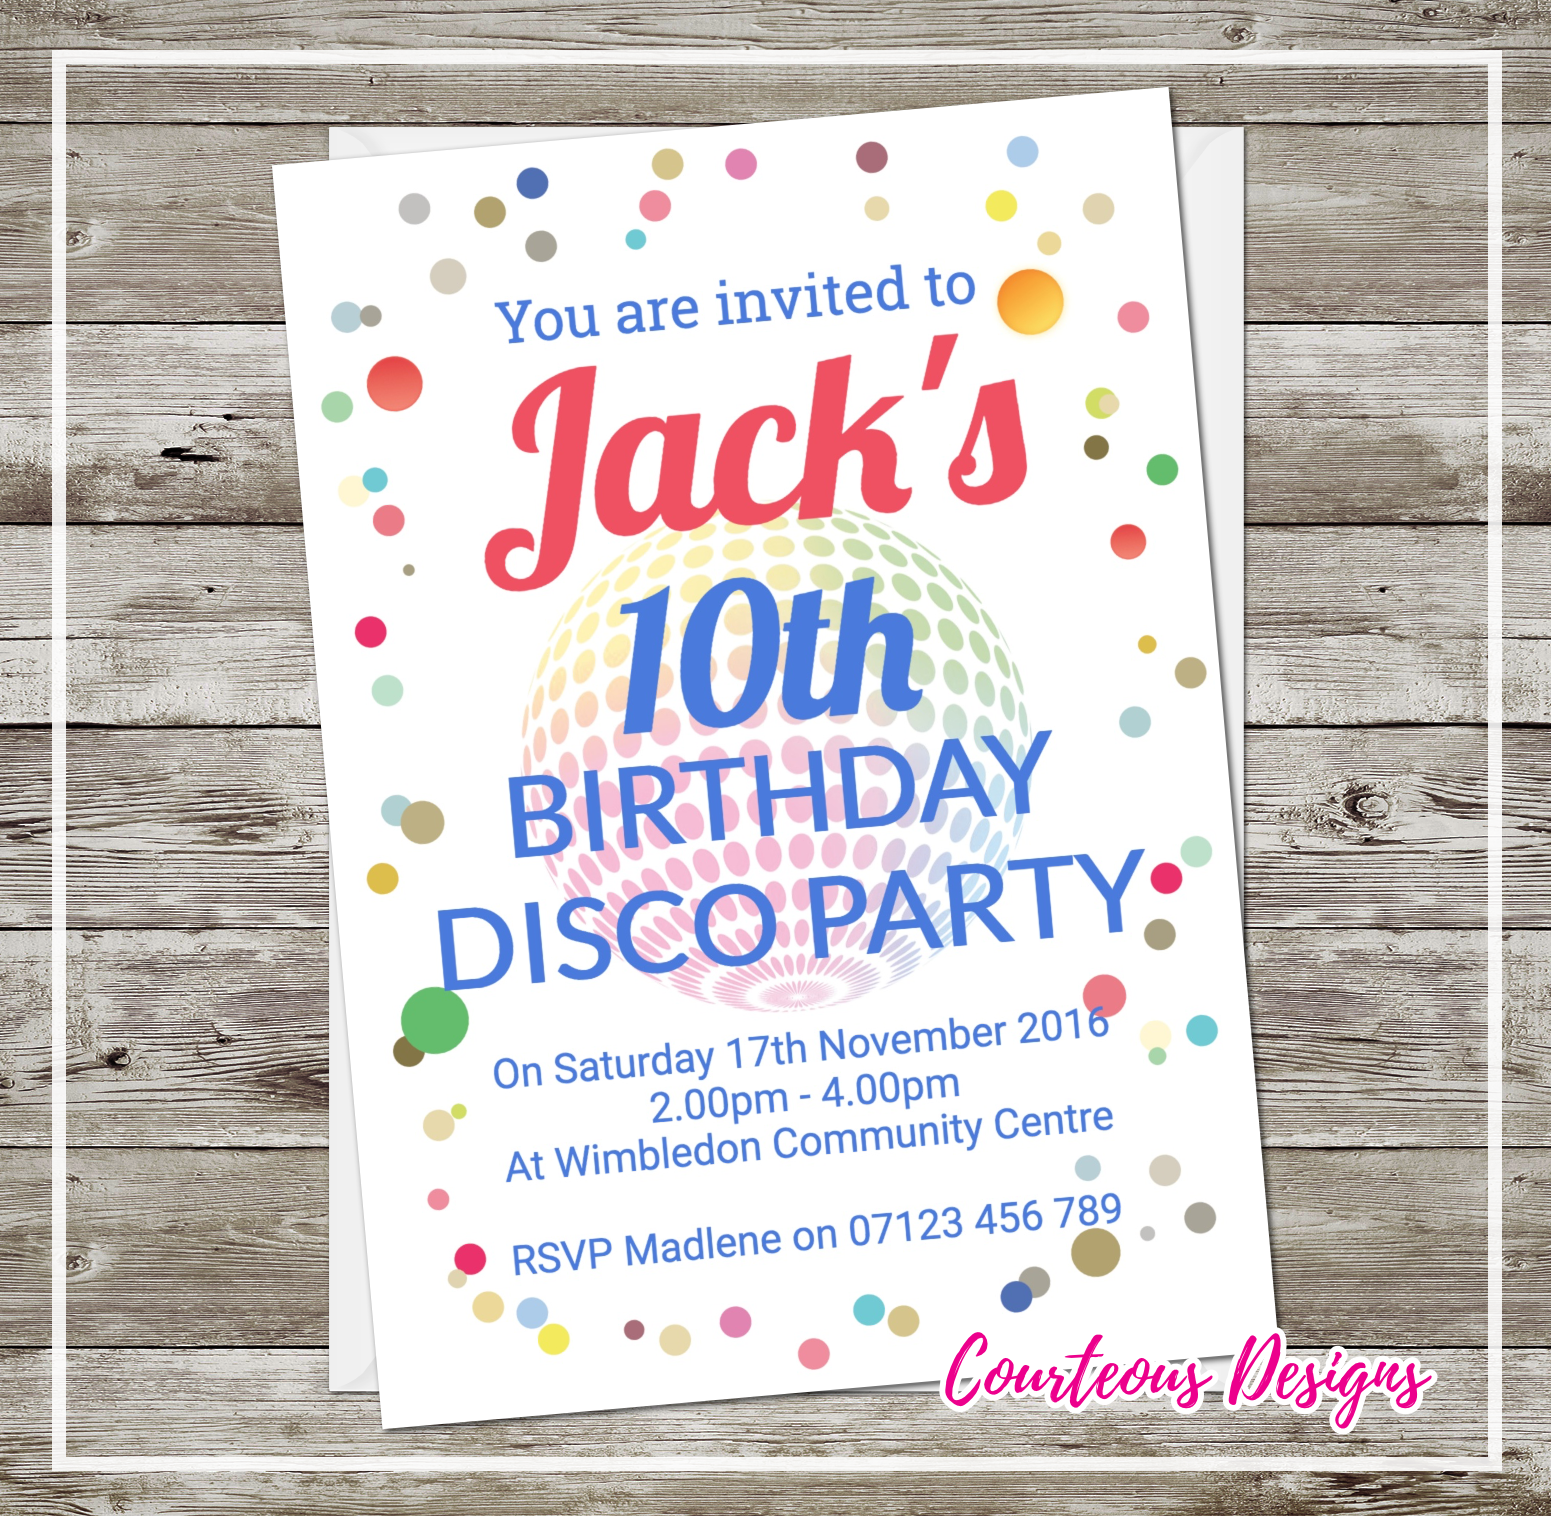 Disco Party Invitations | Product categories | SuaveCards.com